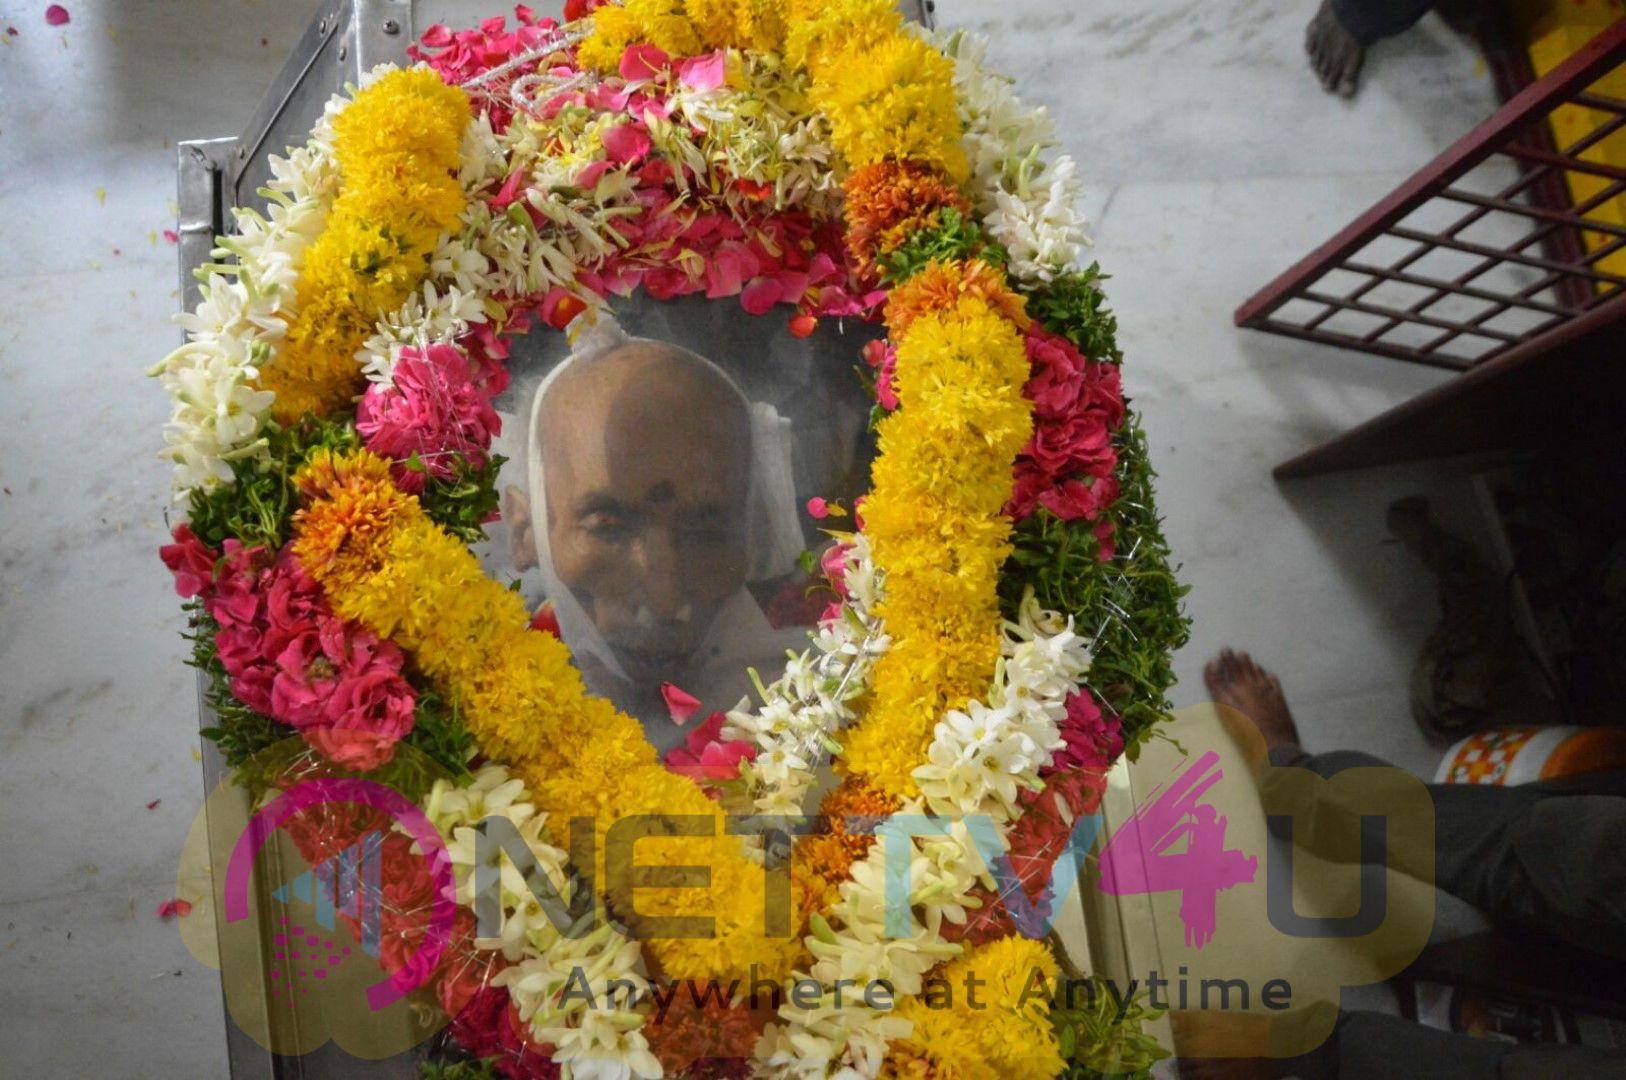 Chiranjeevi And Allu Aravind Has Paid Tribute To Nandagopal Exclusive Pics